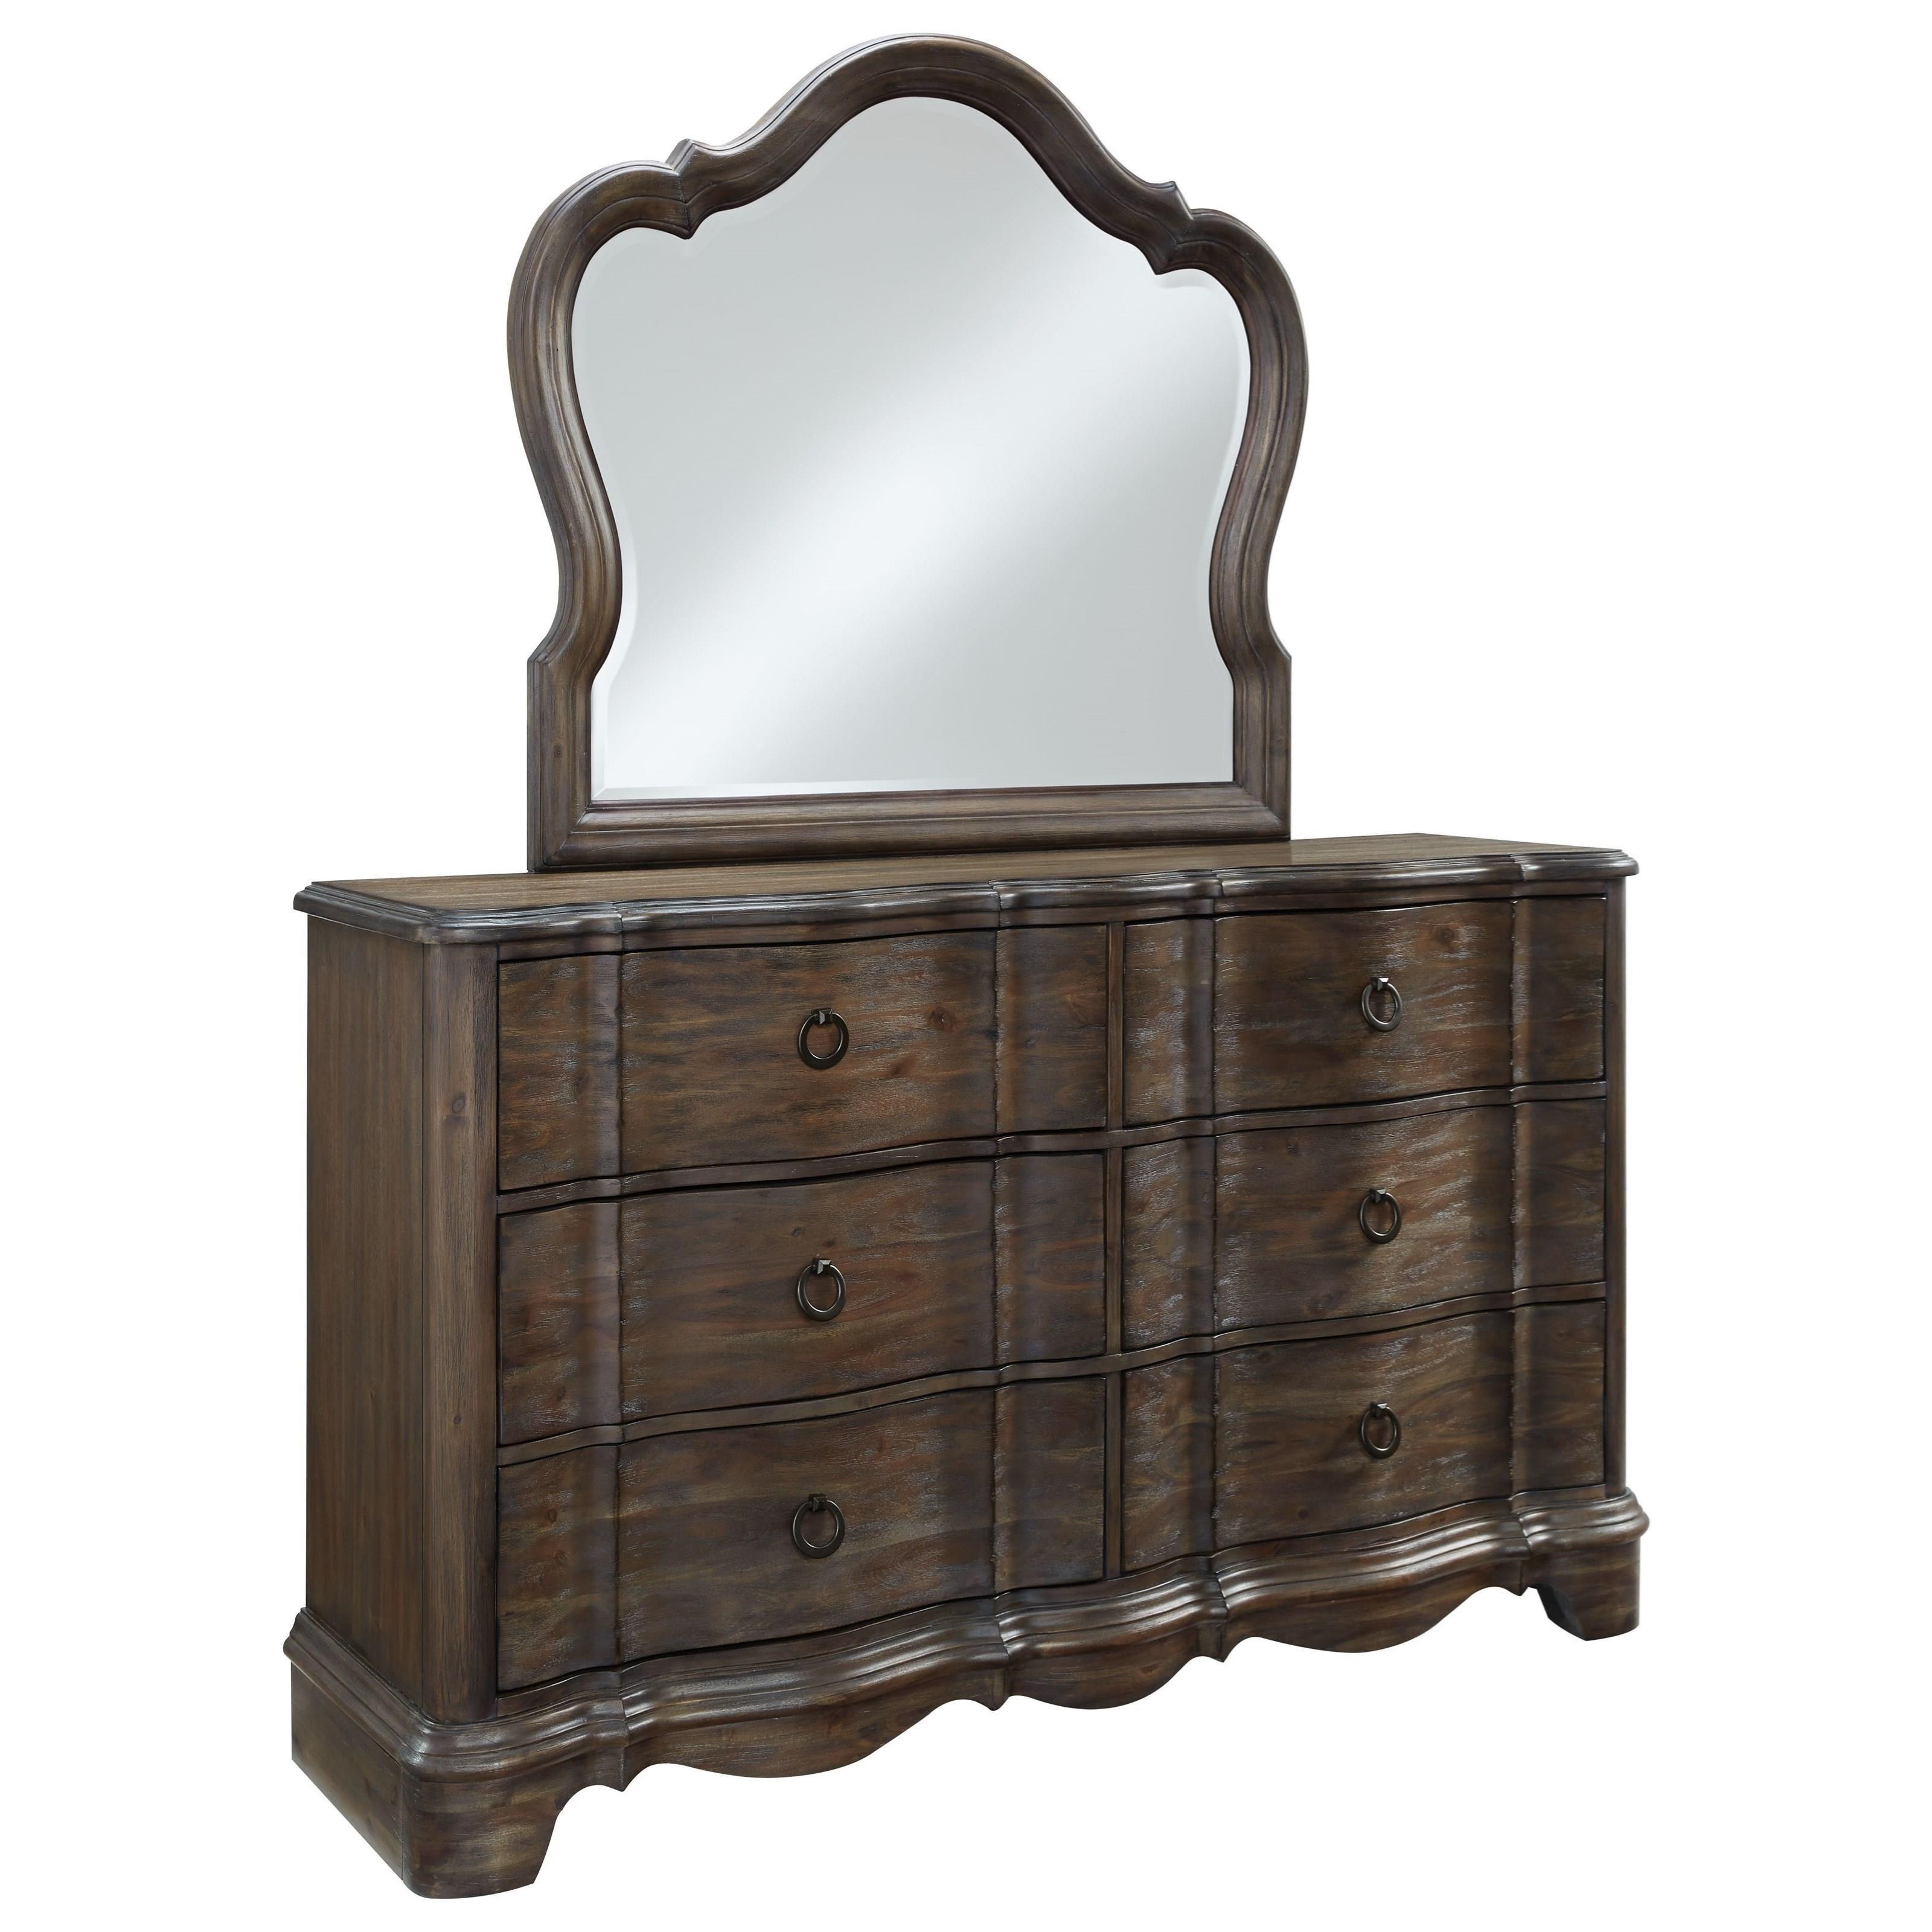 Standard Furniture Parliament Dresser - Item Number: 92359